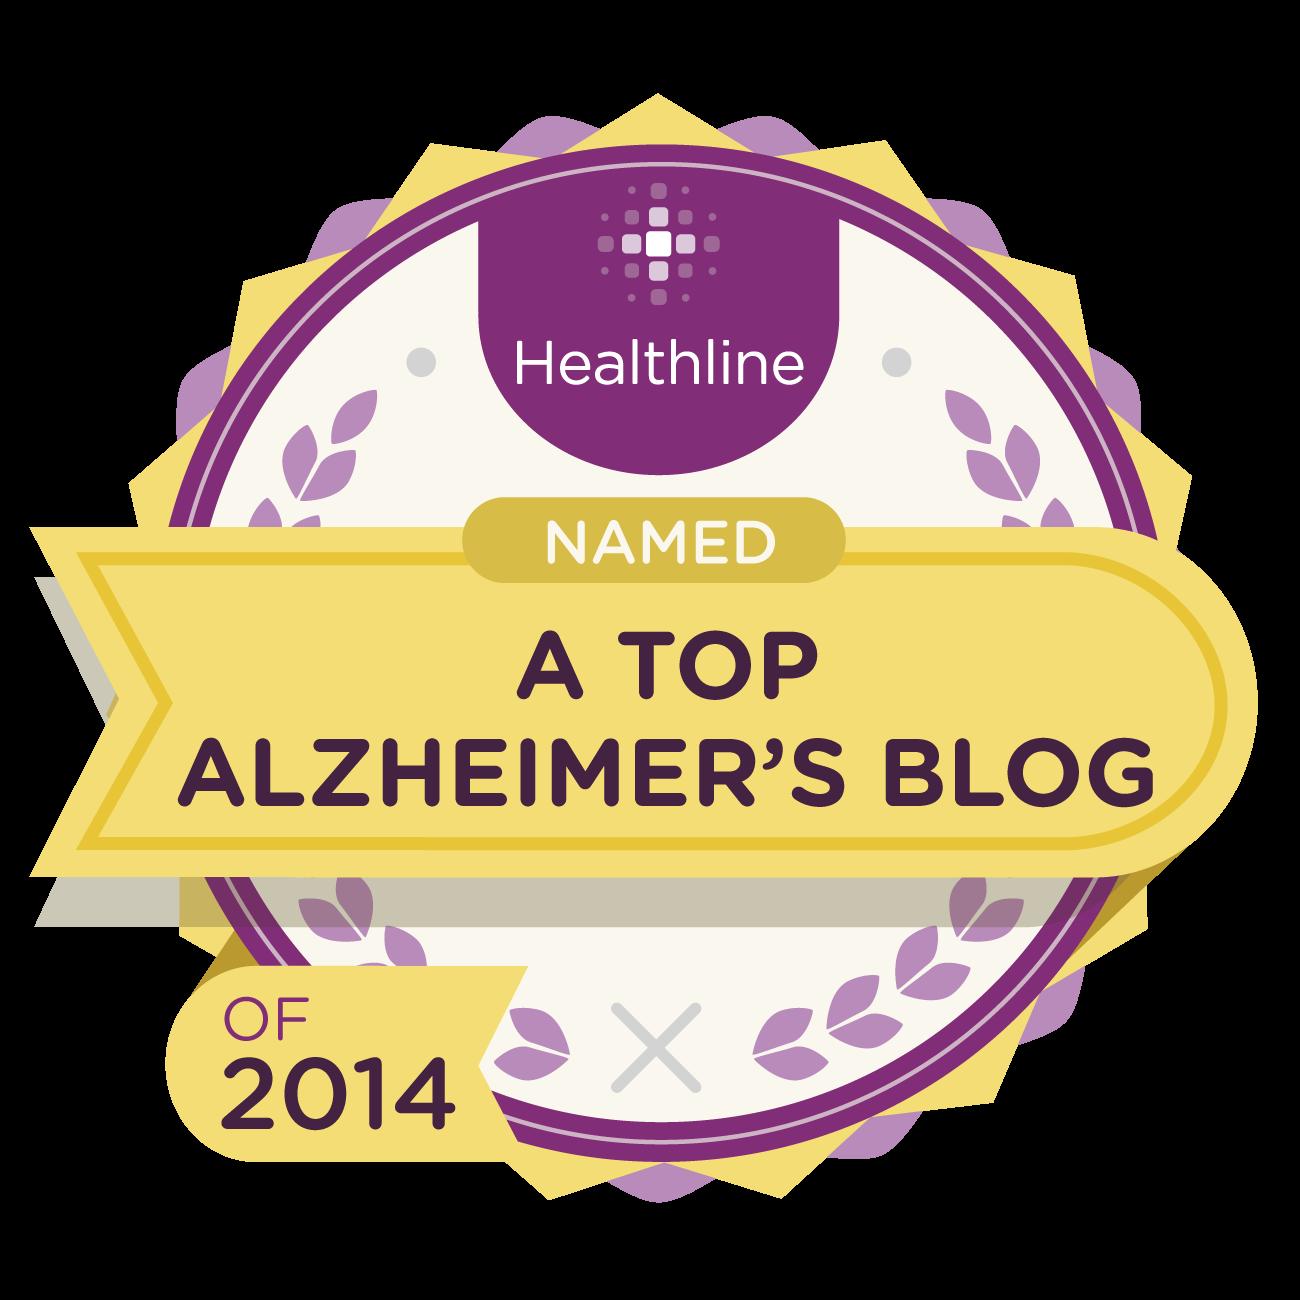 The 25 Best Alzheimer's Blogs of 2014